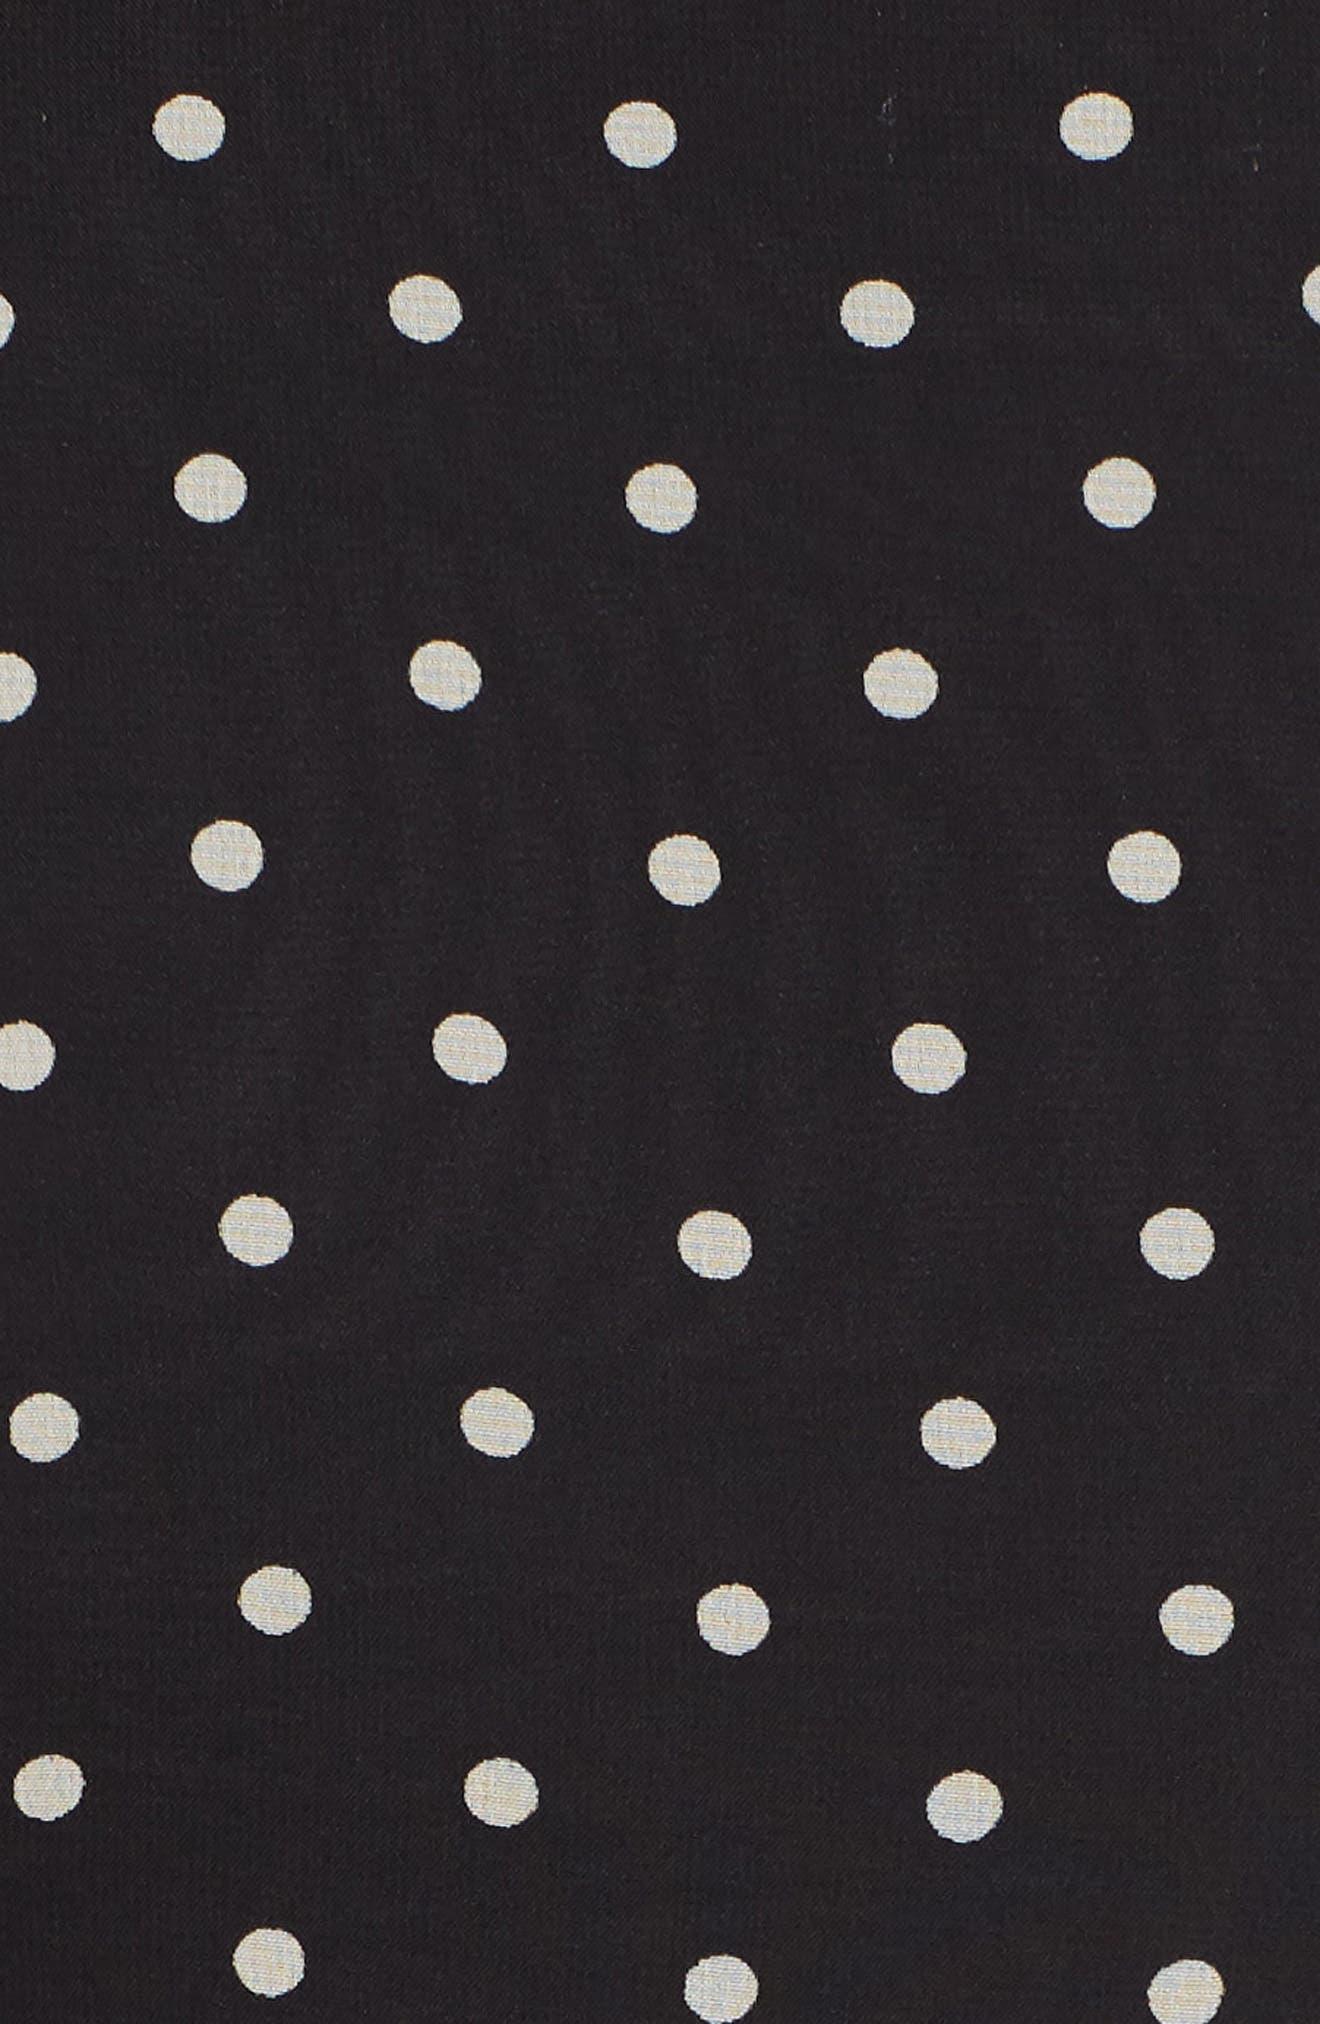 New York Dotted Chiffon Dress,                             Alternate thumbnail 5, color,                             Black/ White